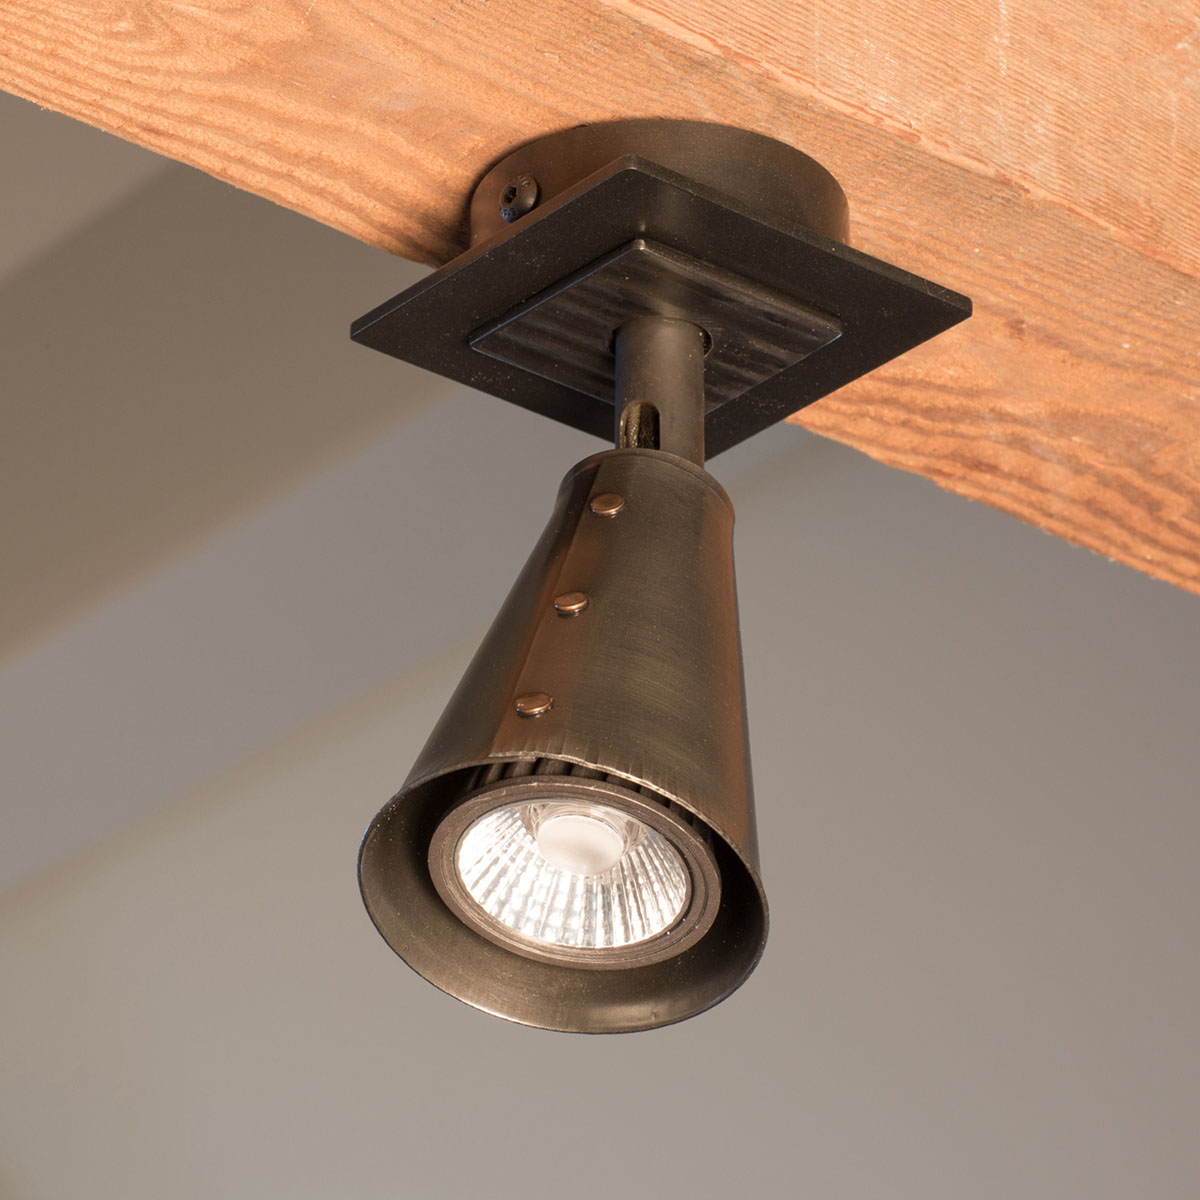 Ceiling light - spotlight ceiling light - illions